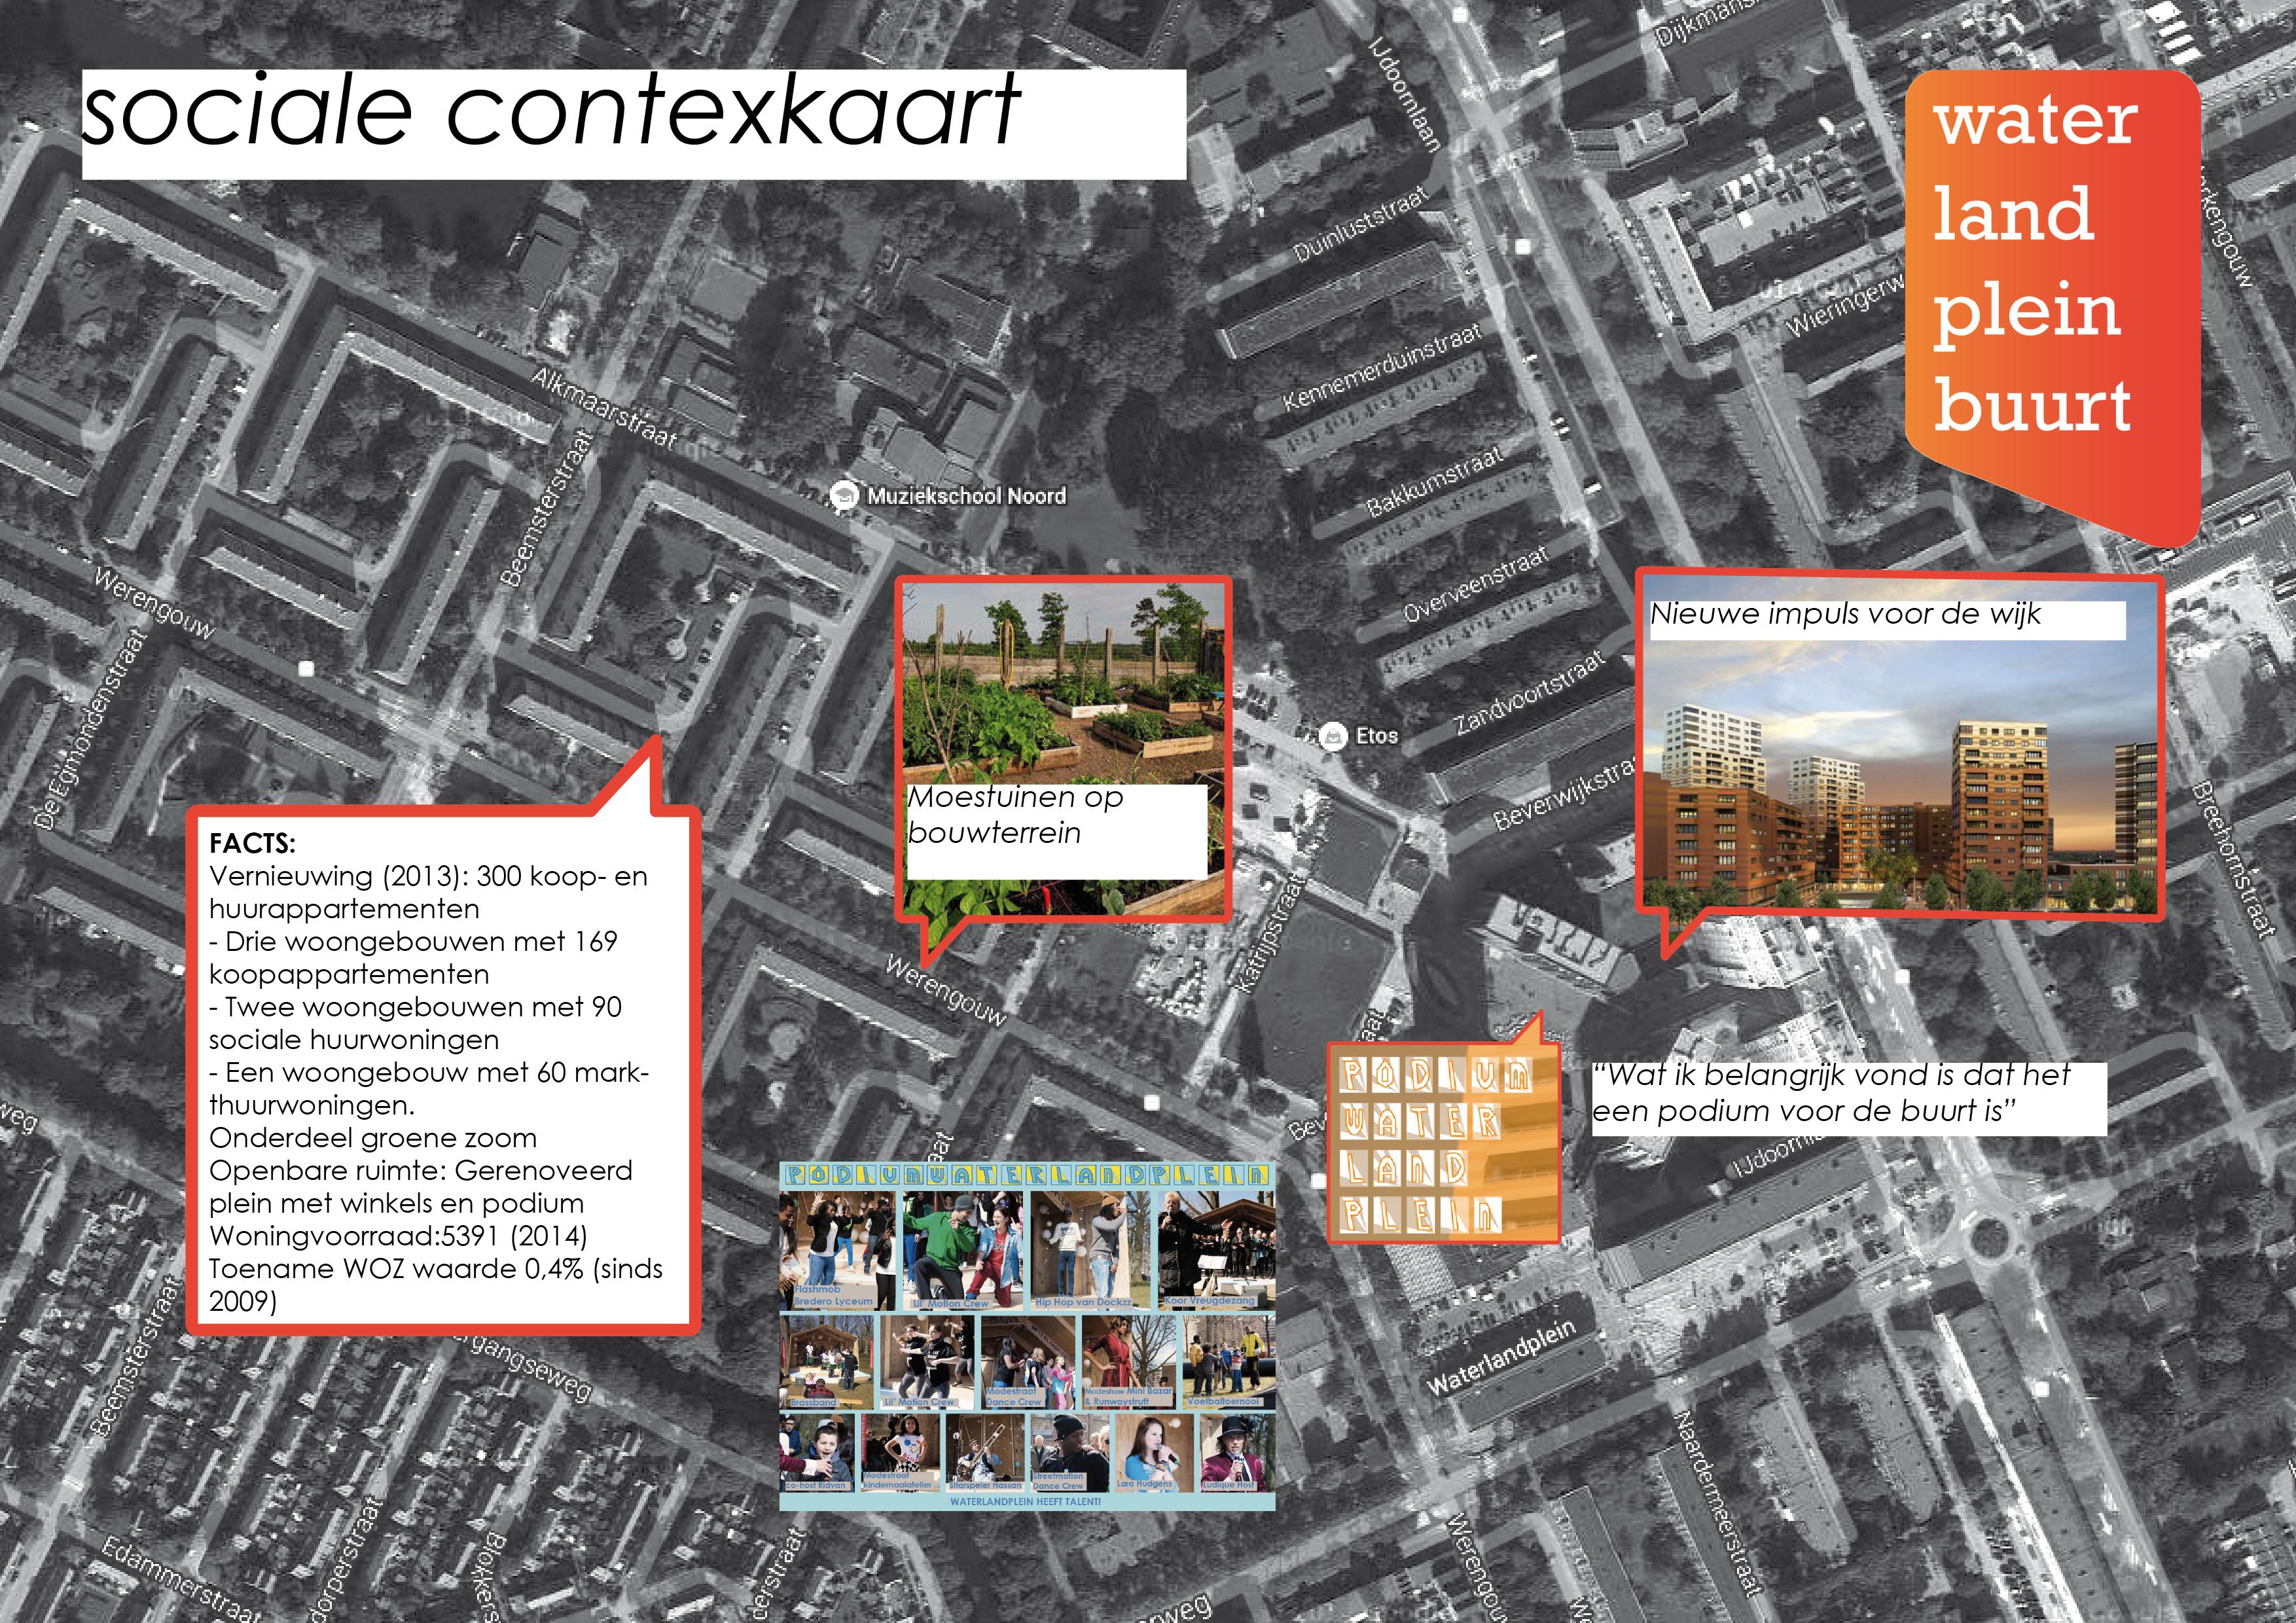 Sociale_contexkaart_waterlandplein